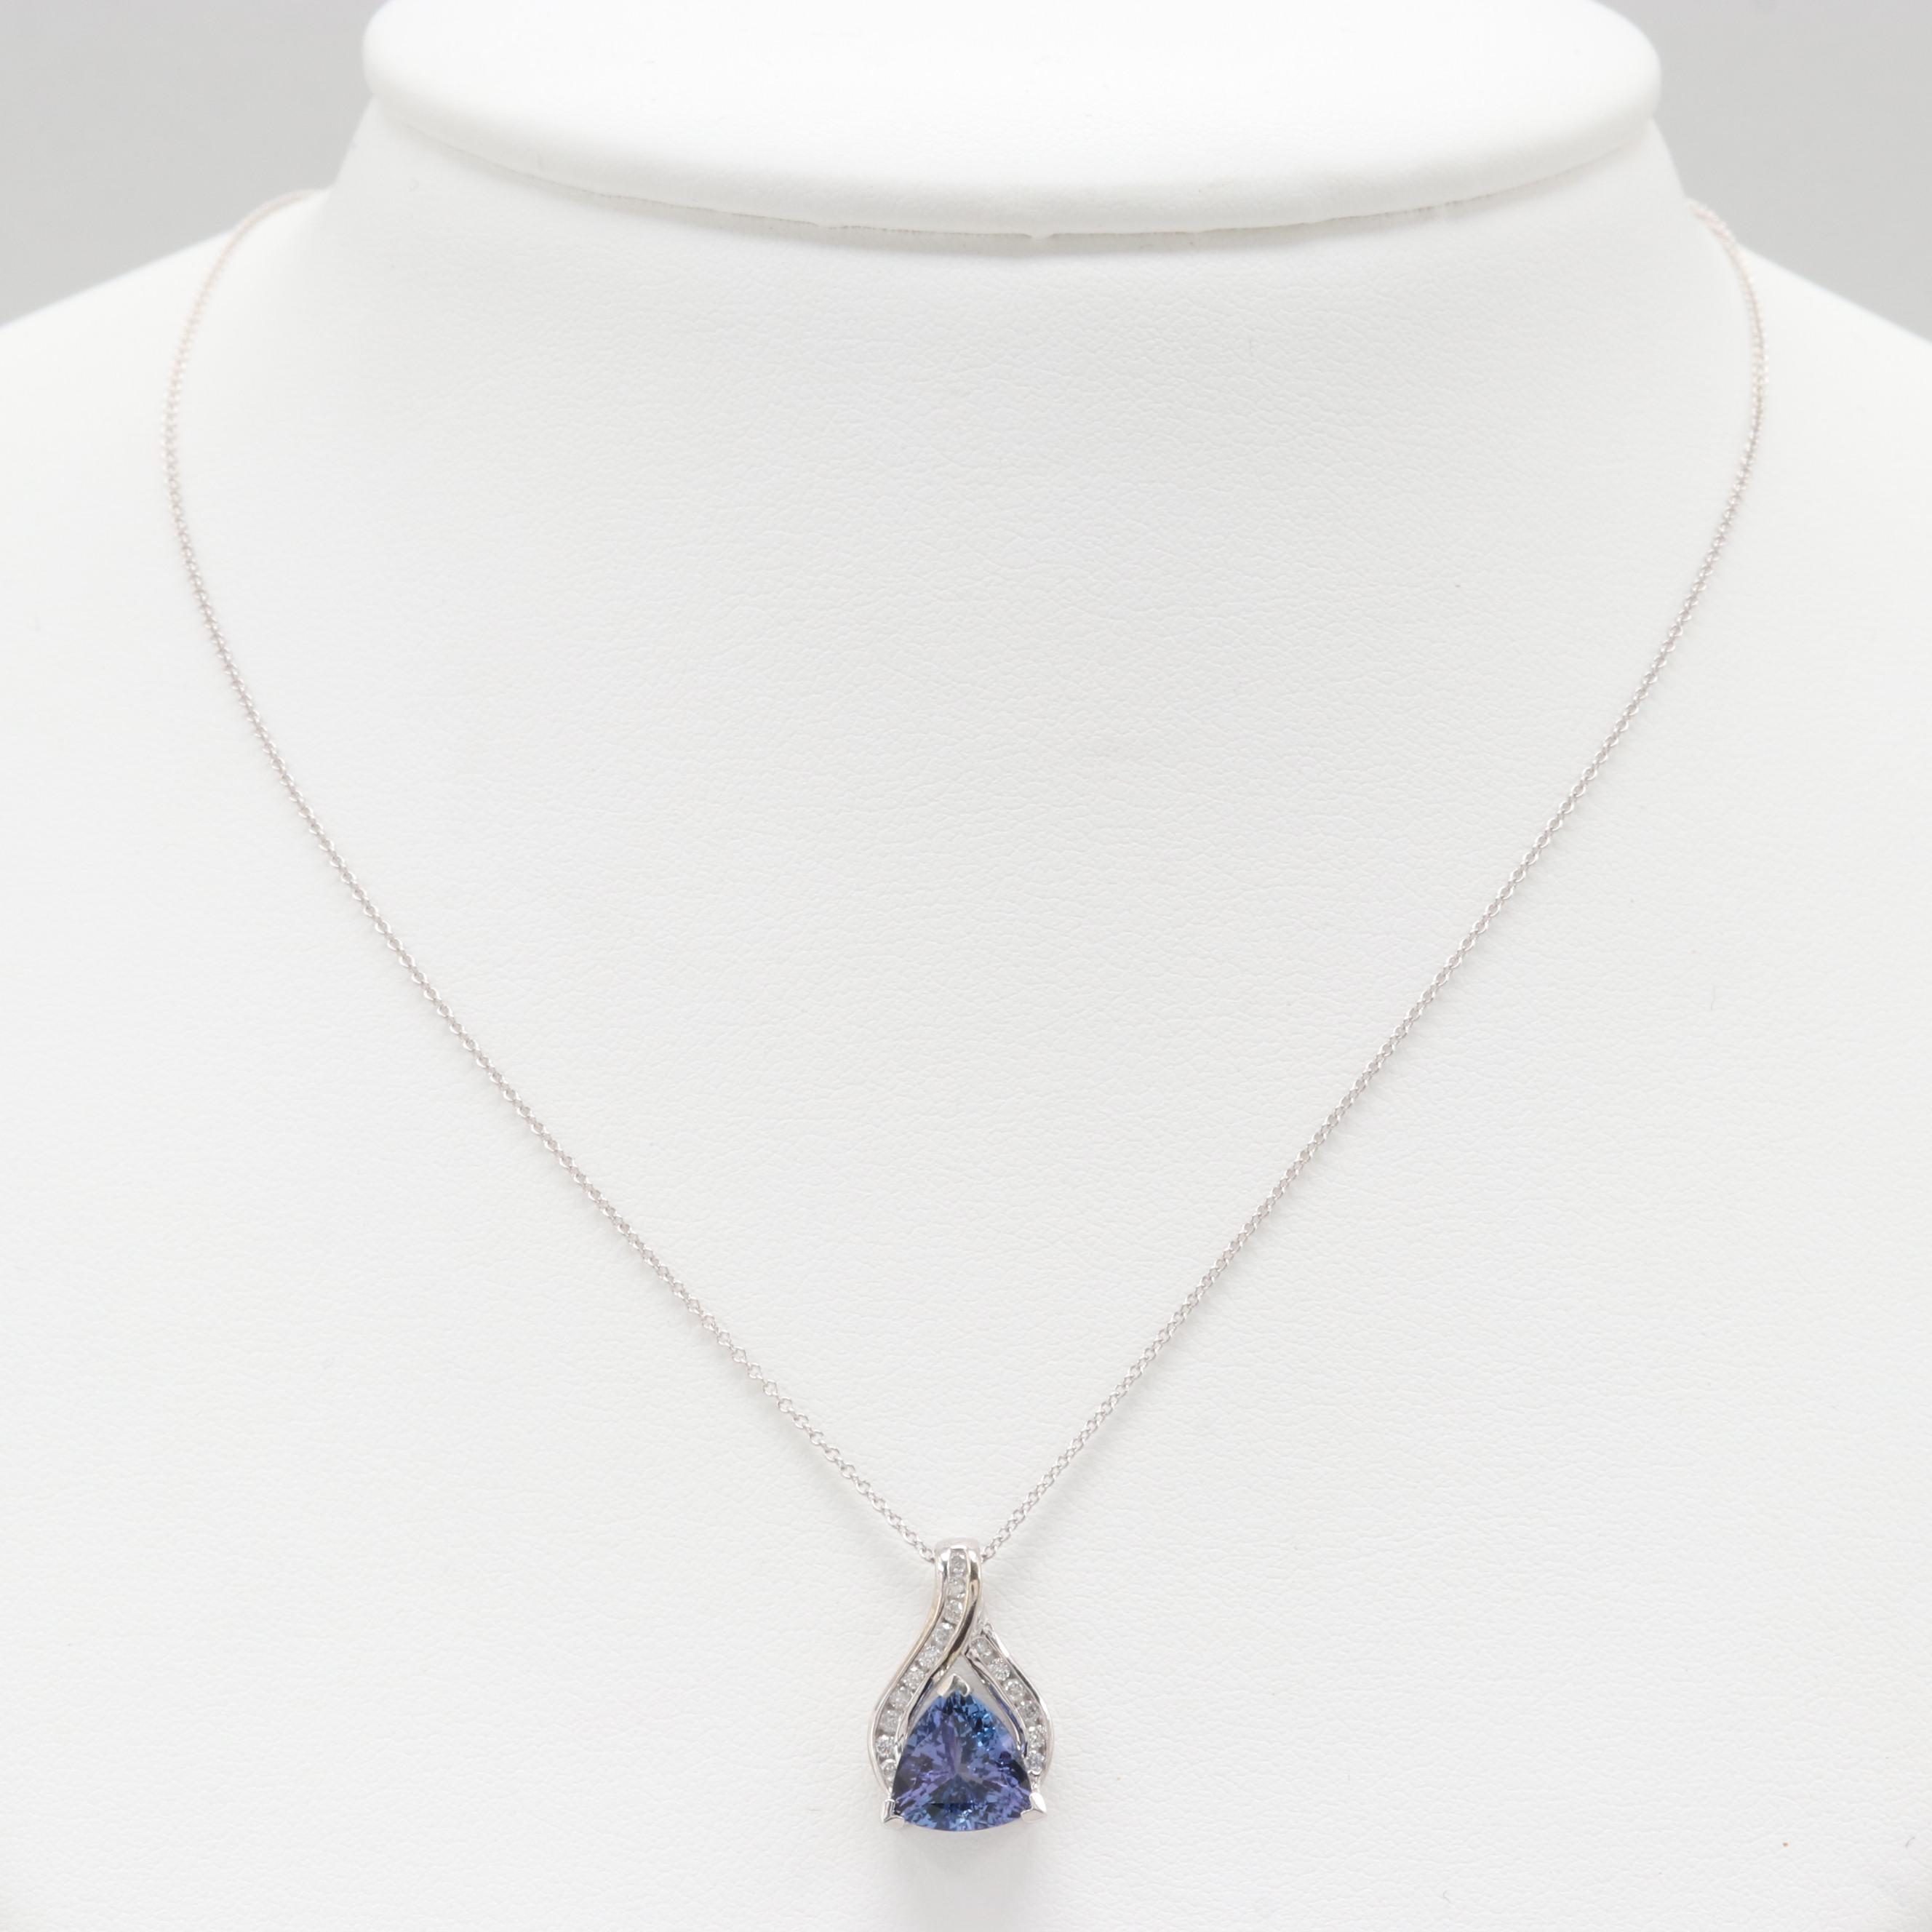 14K White Gold Tanzanite and Diamond Pendant Necklace